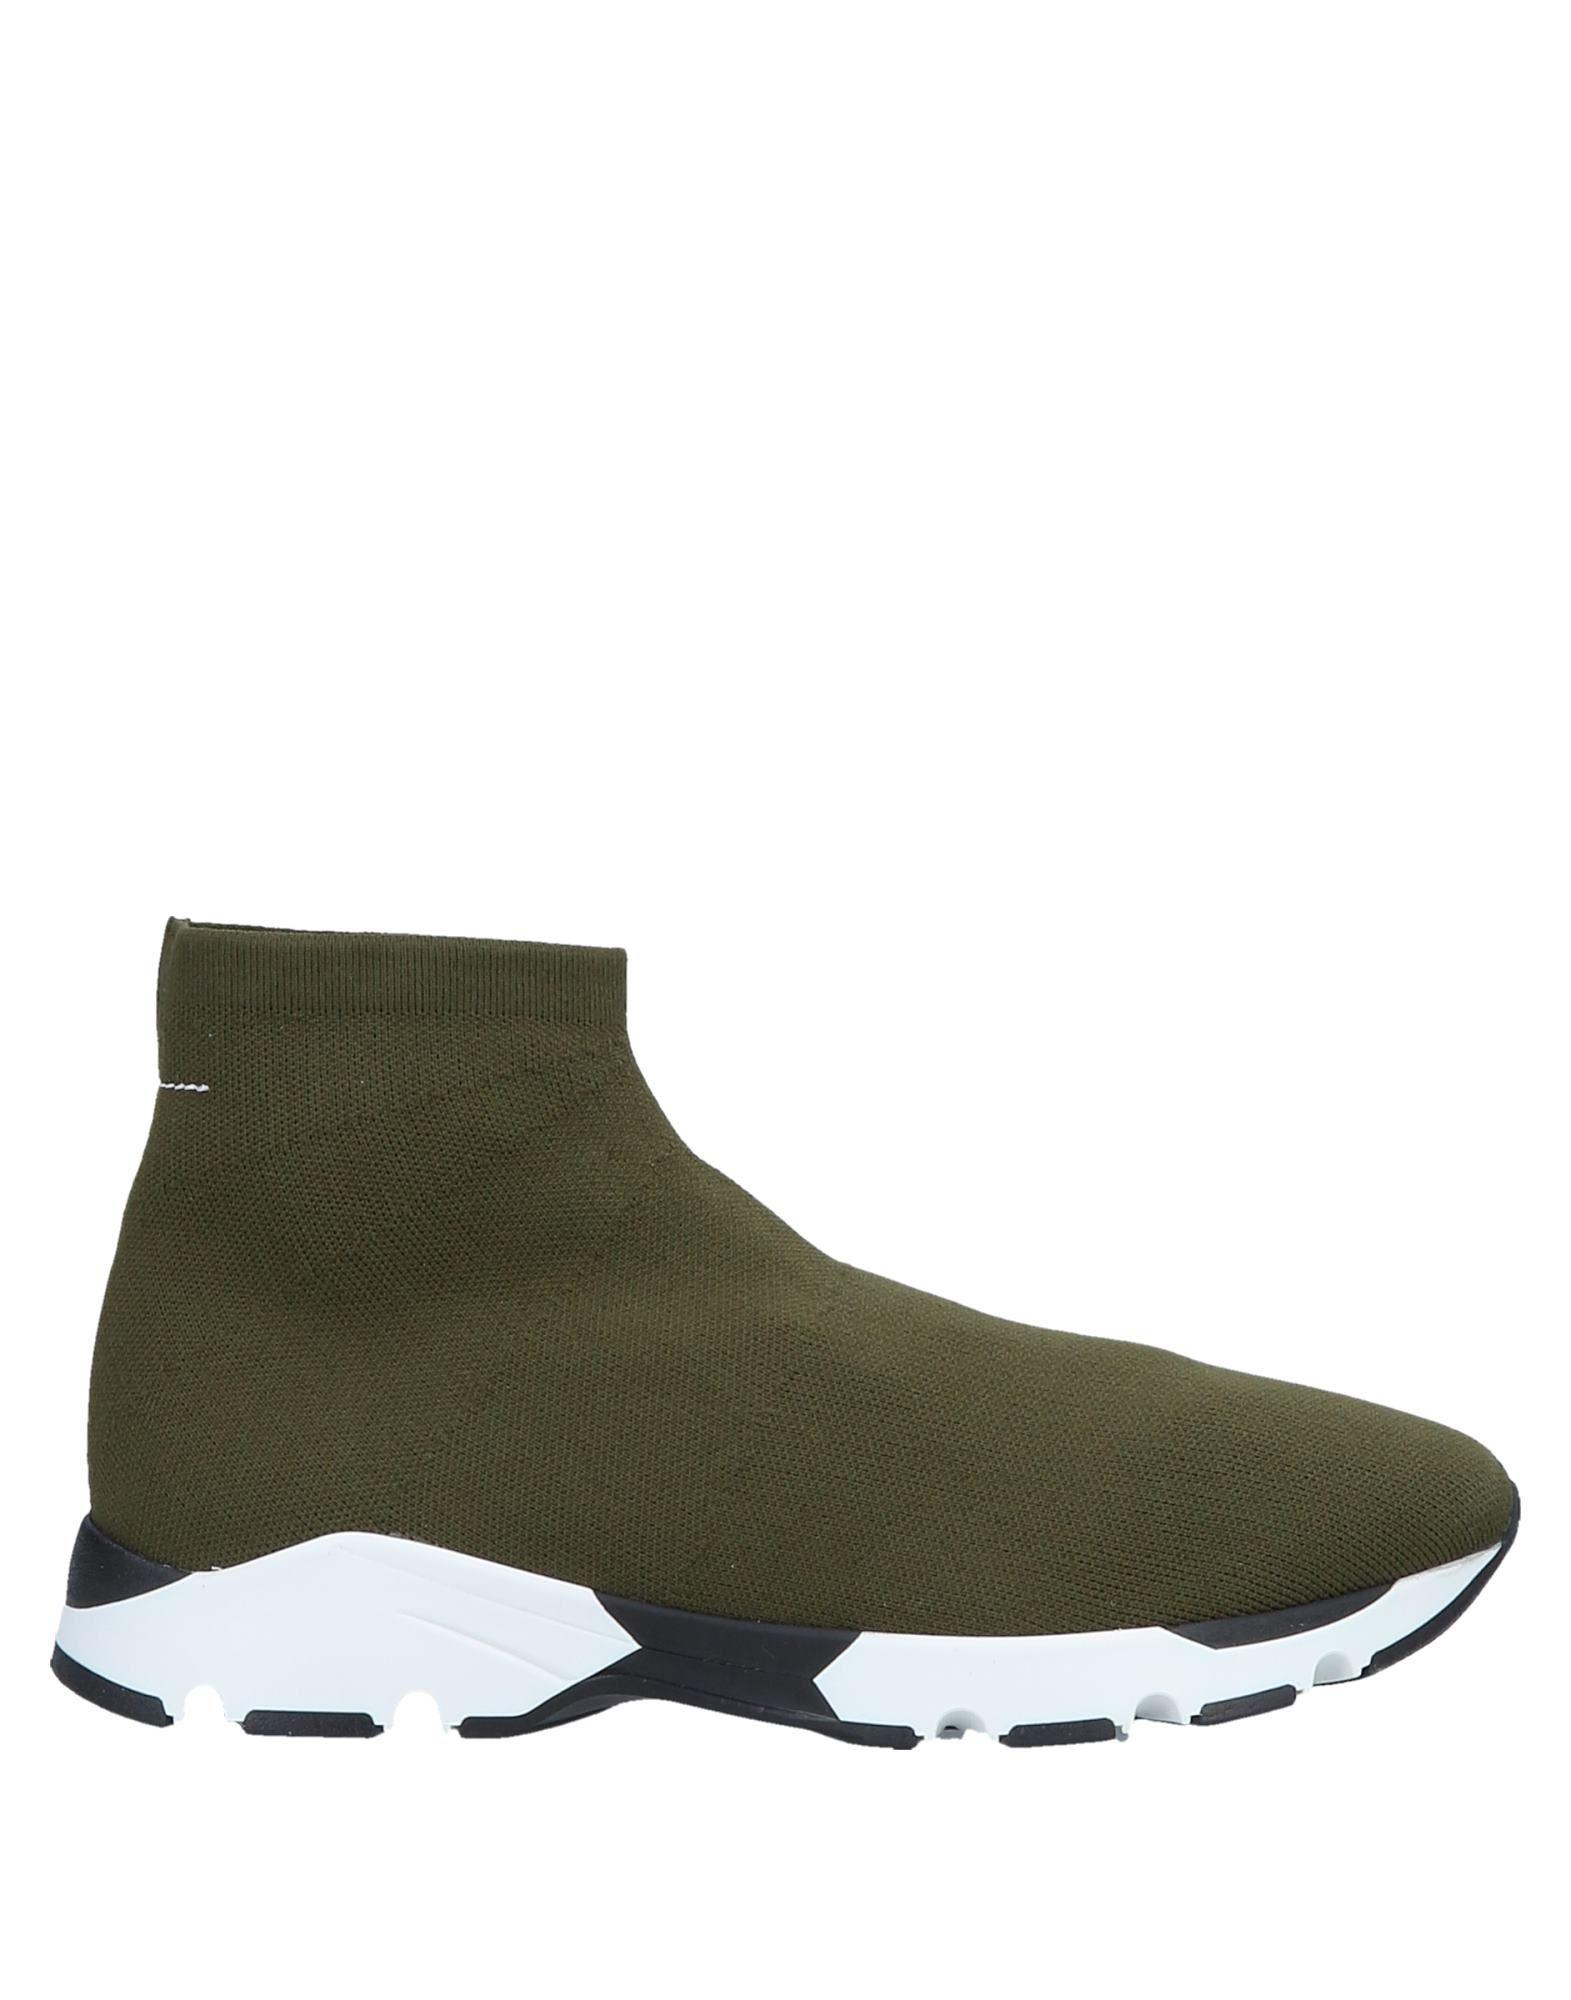 Mm6 Maison Margiela Sneakers - Women Mm6 Maison Margiela Sneakers Kingdom online on  United Kingdom Sneakers - 11569471GI 6ef93b